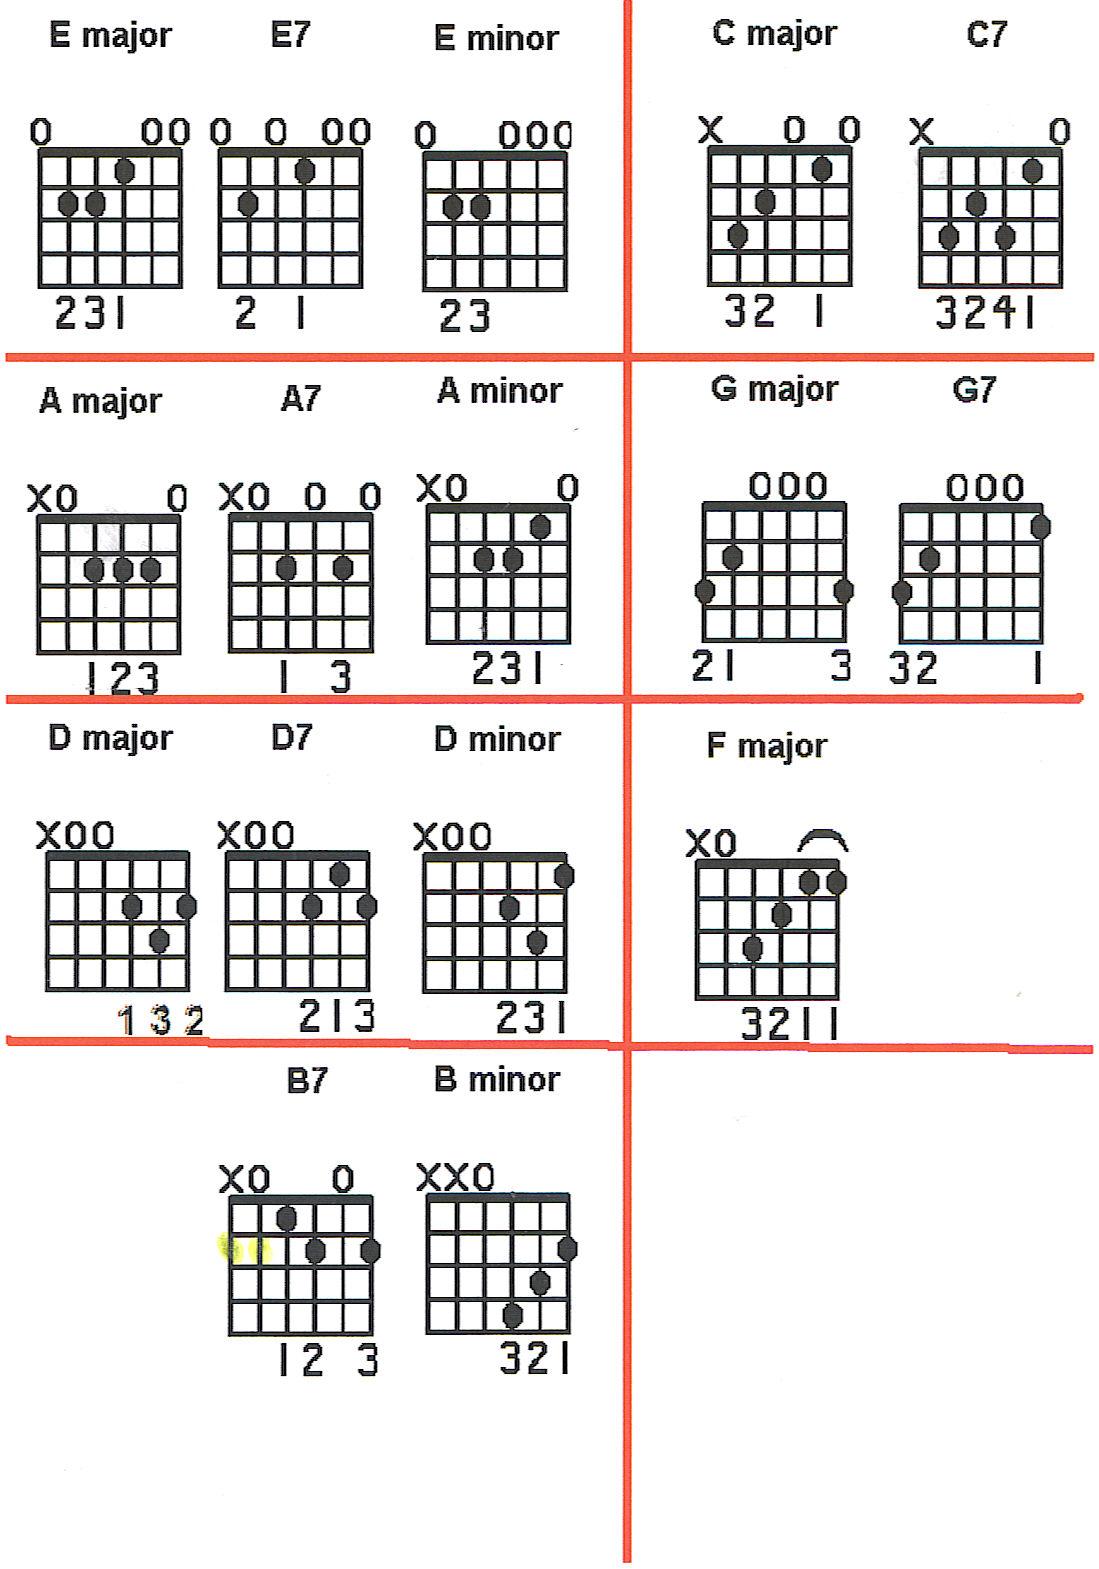 Self-Made Guitar Aids, Enjoy - The Pub - Shroomery Message Board